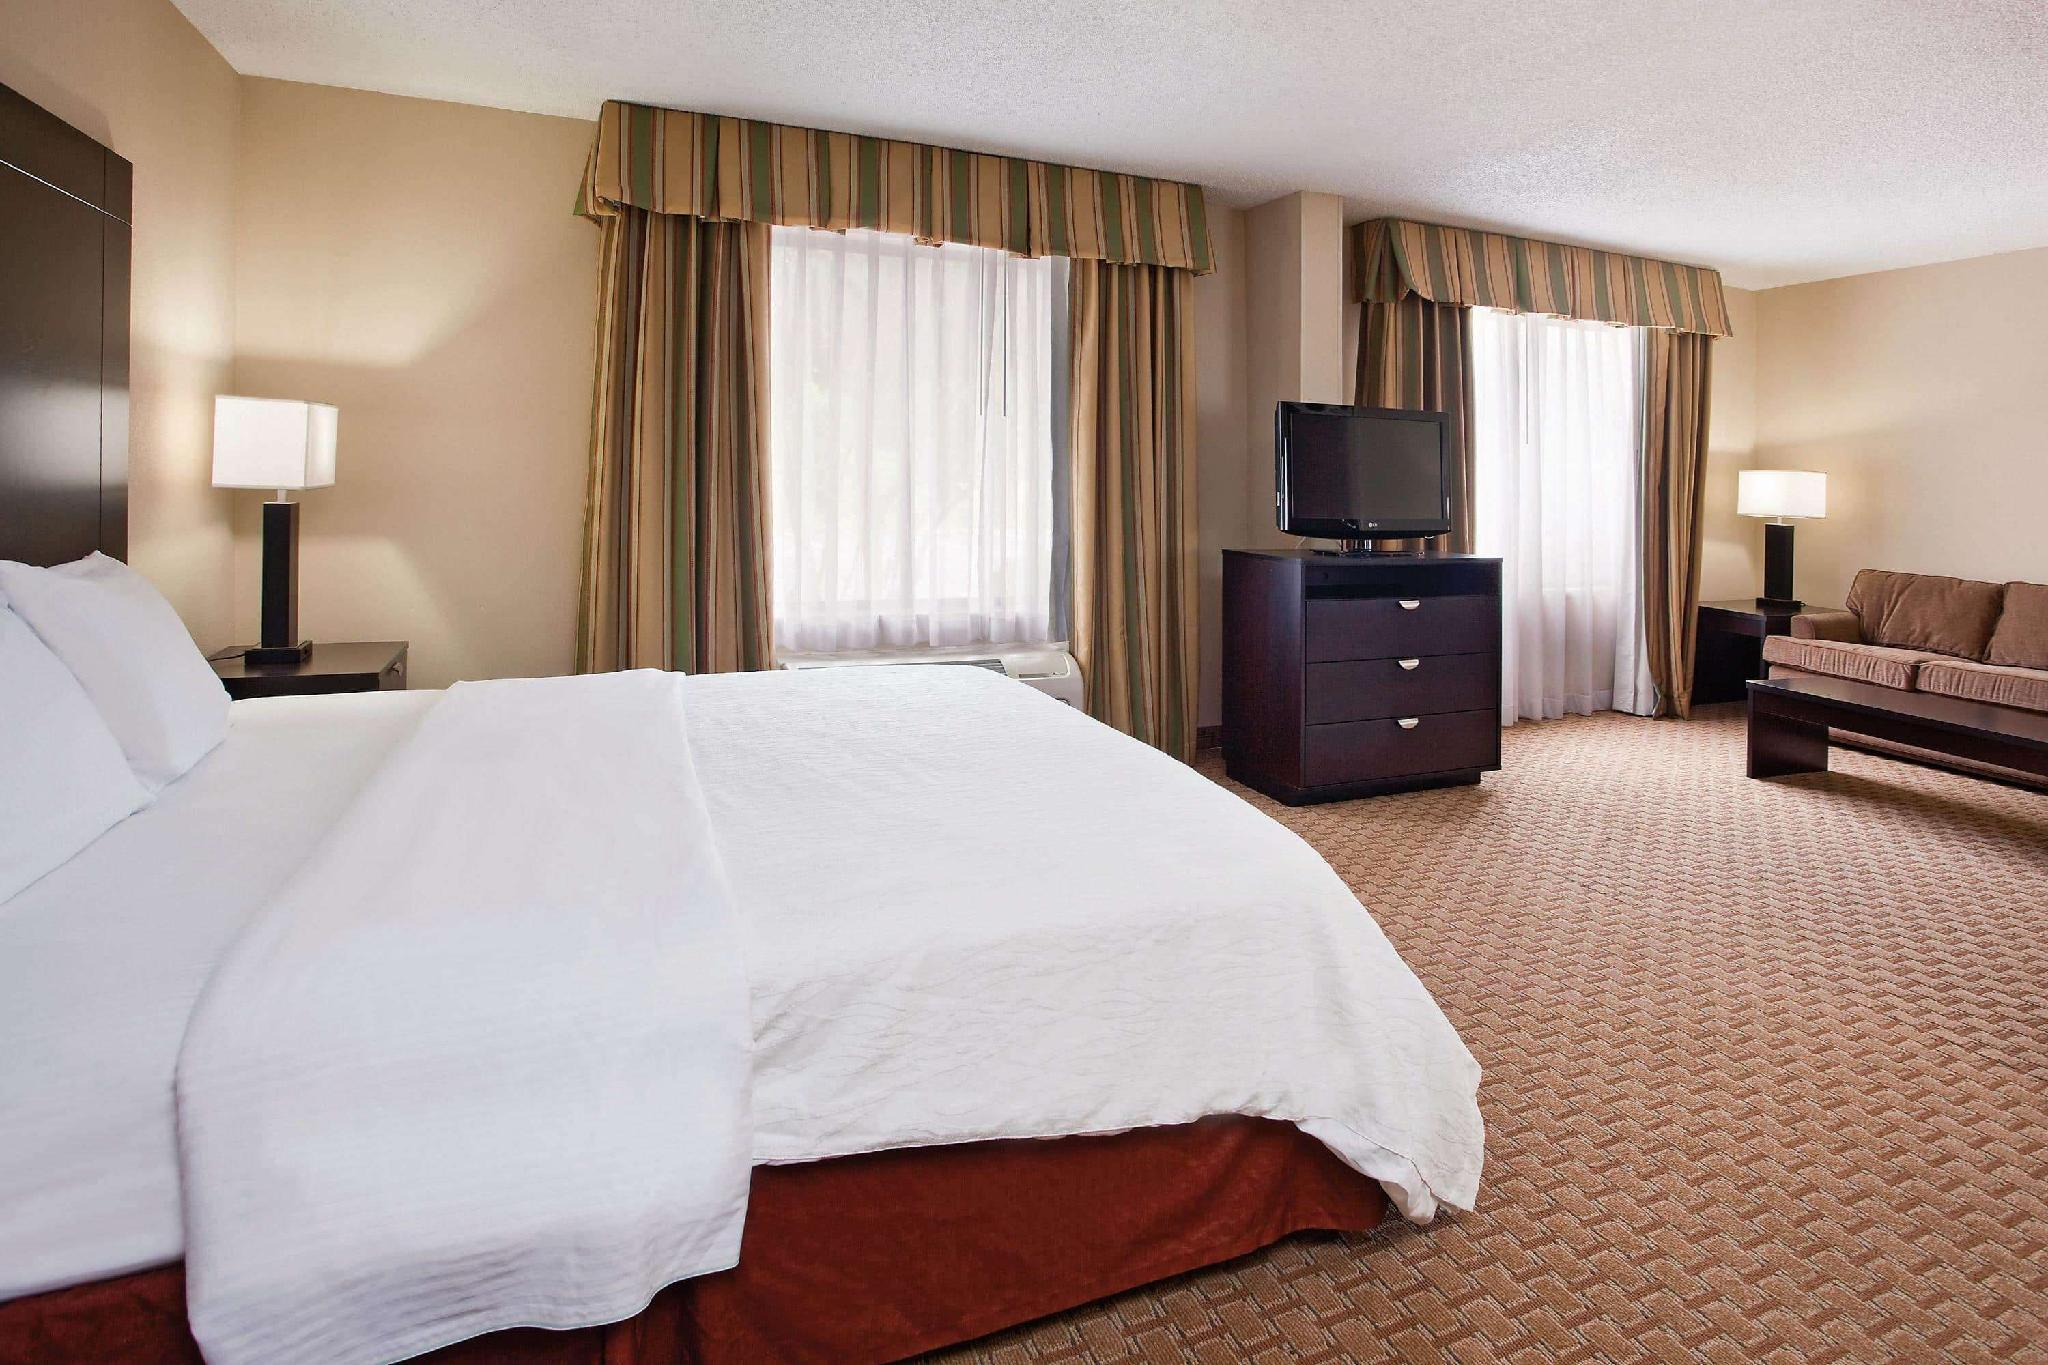 La Quinta Inn & Suites By Wyndham Dalton